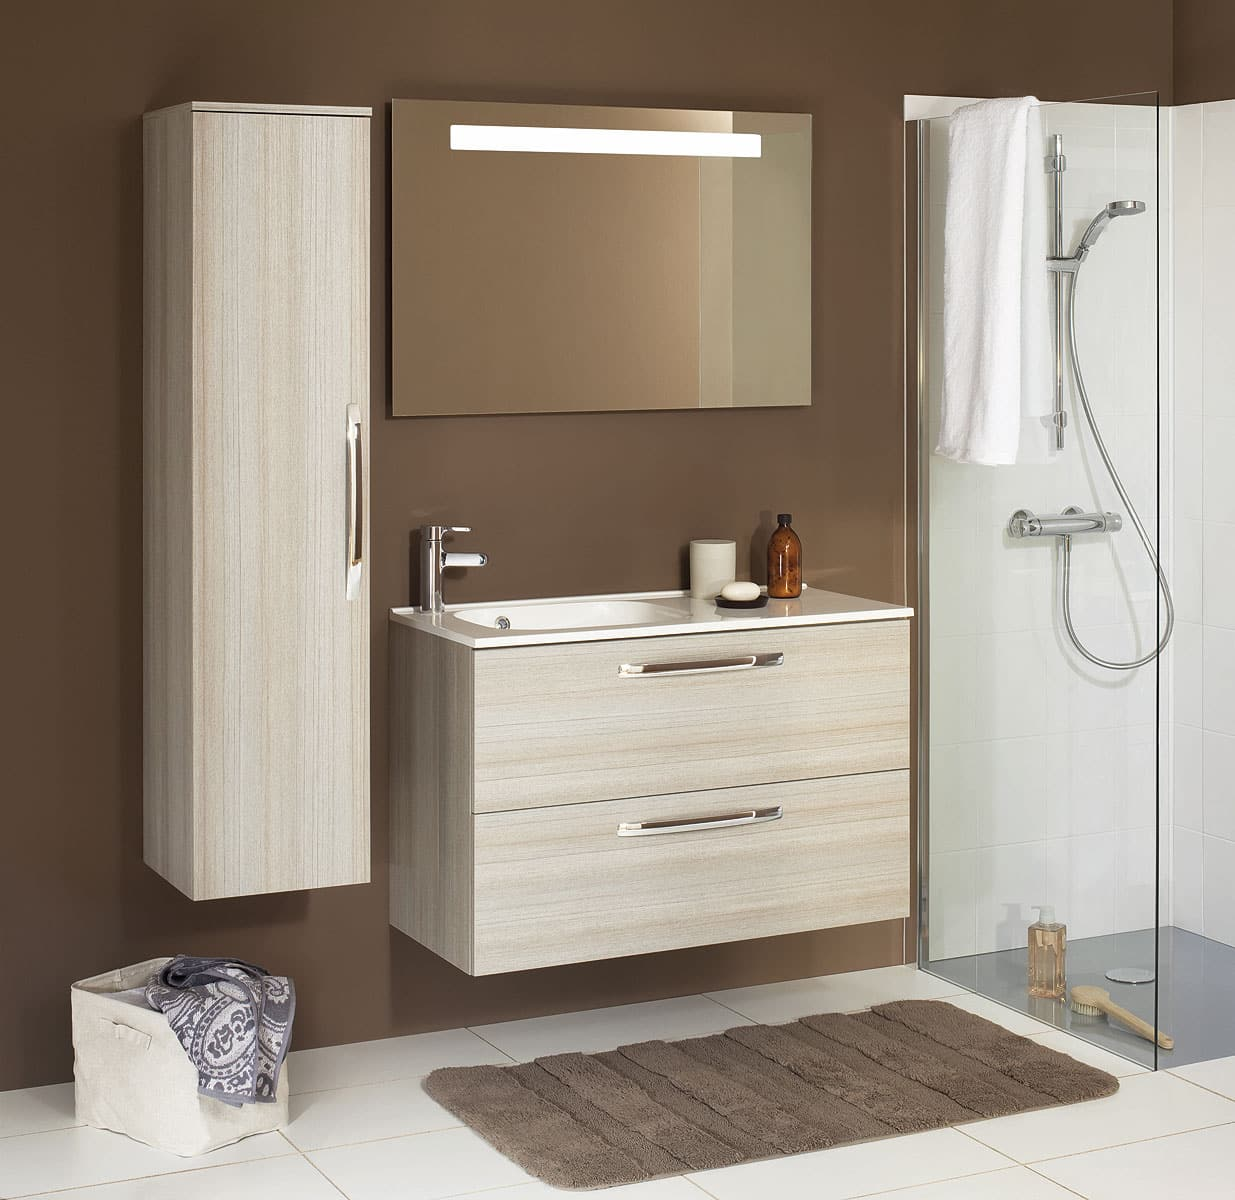 meubles-salle-de-bains-sanijura-impact - Servi\'Bat ...